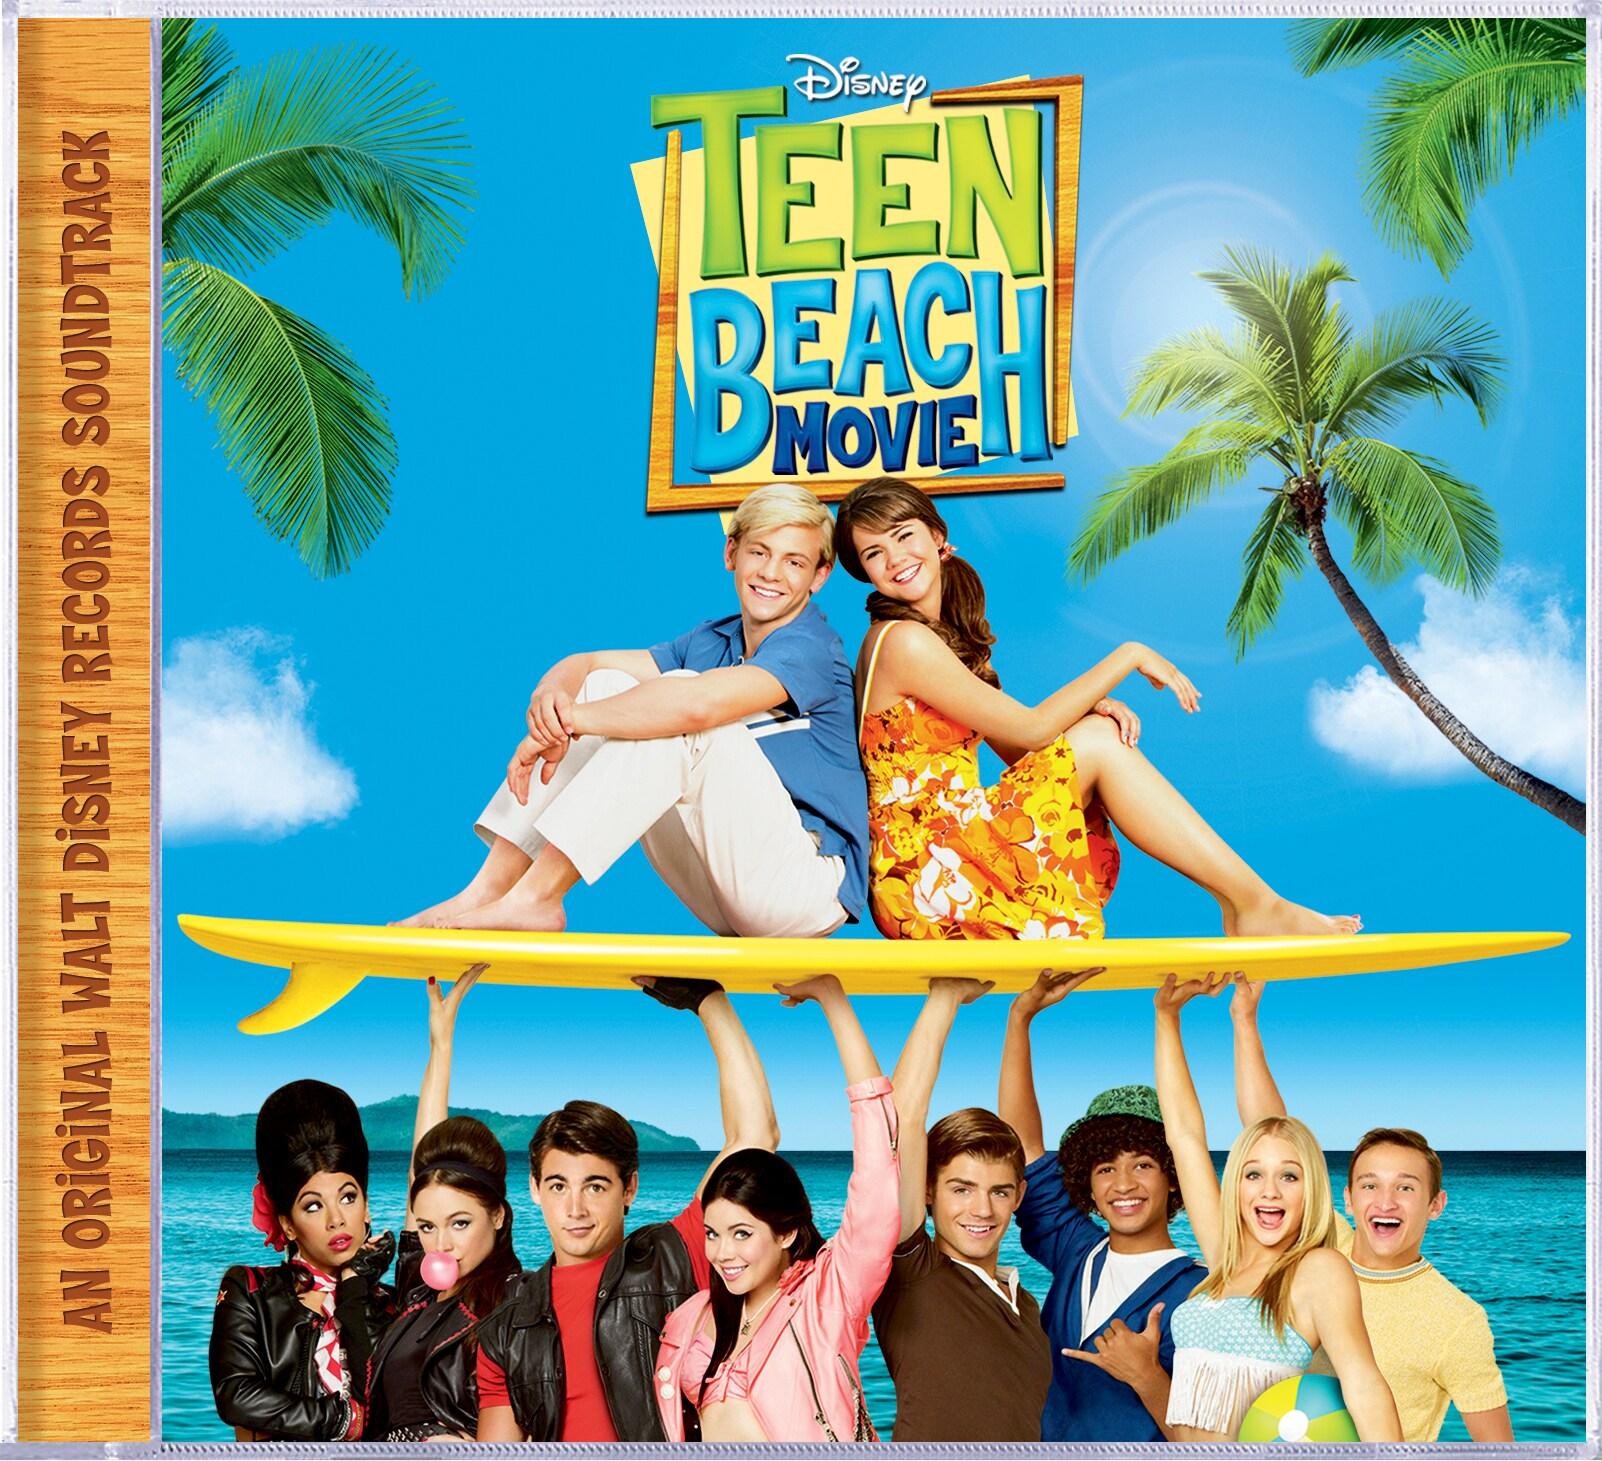 Teenage Beach Movie Toys : Teen beach movie disney music